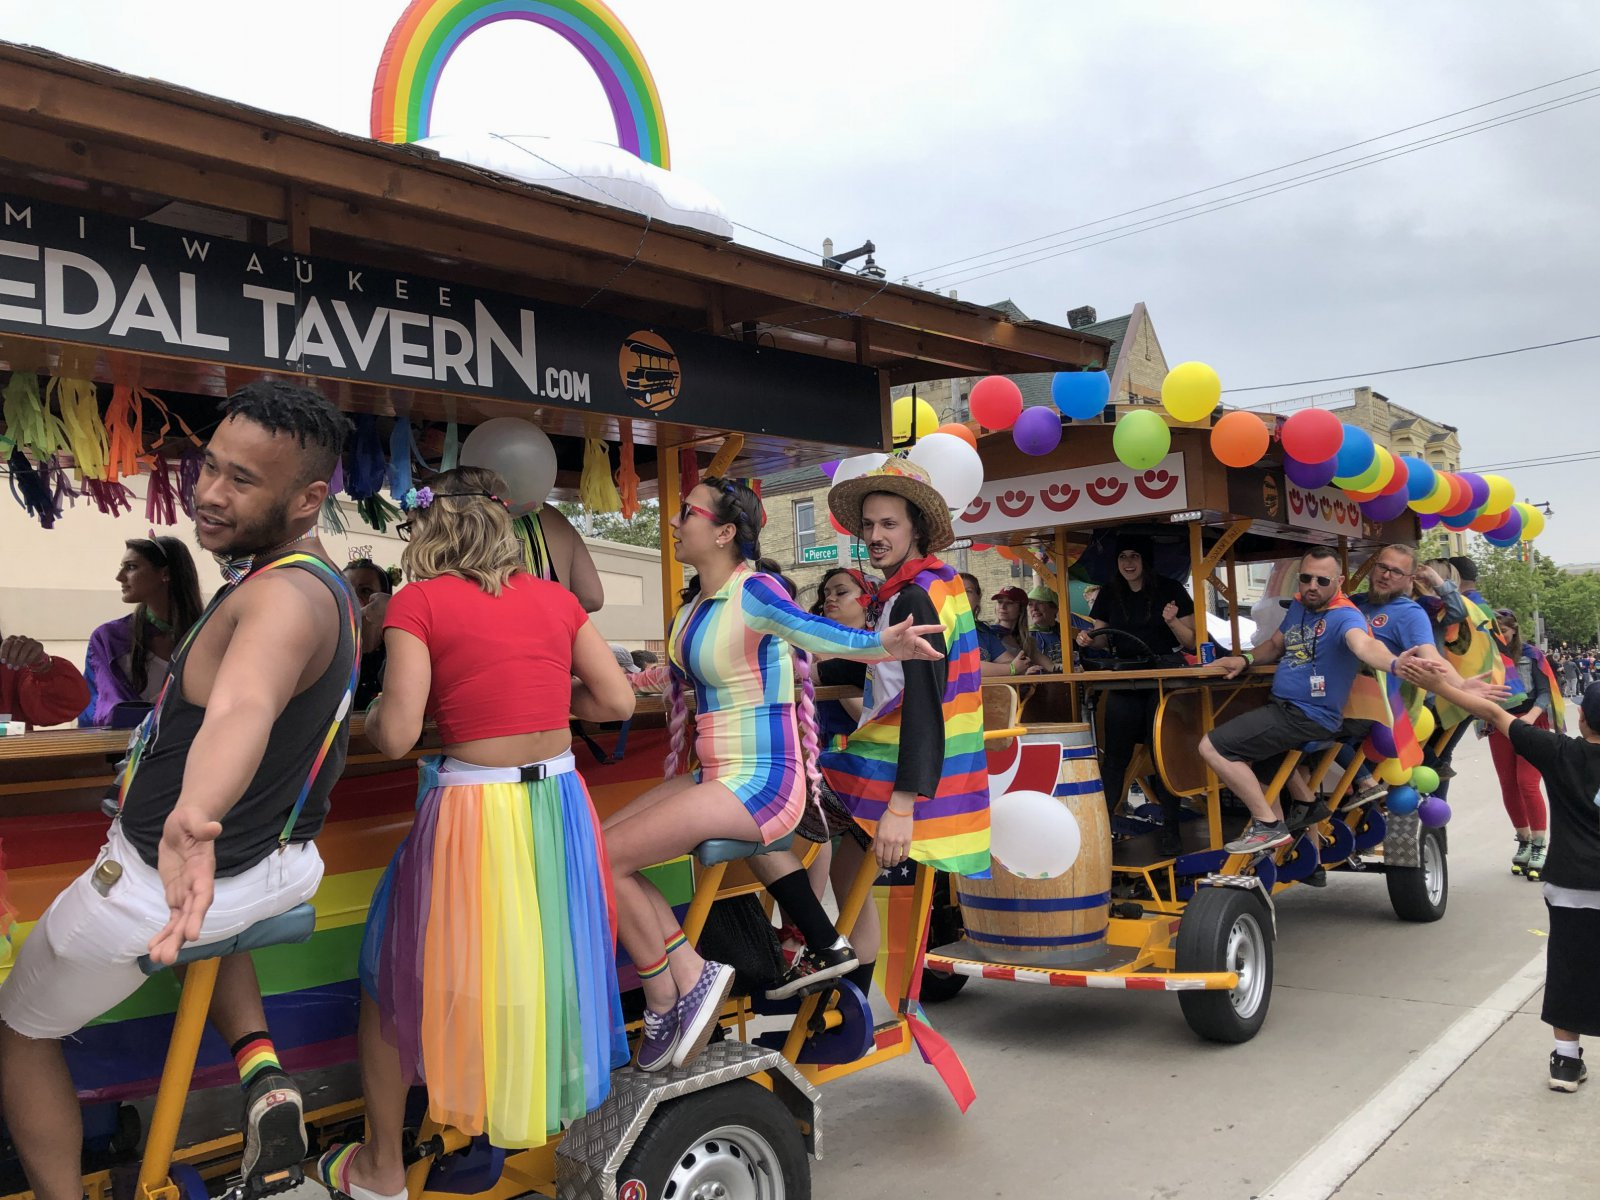 The Pedal Tavern